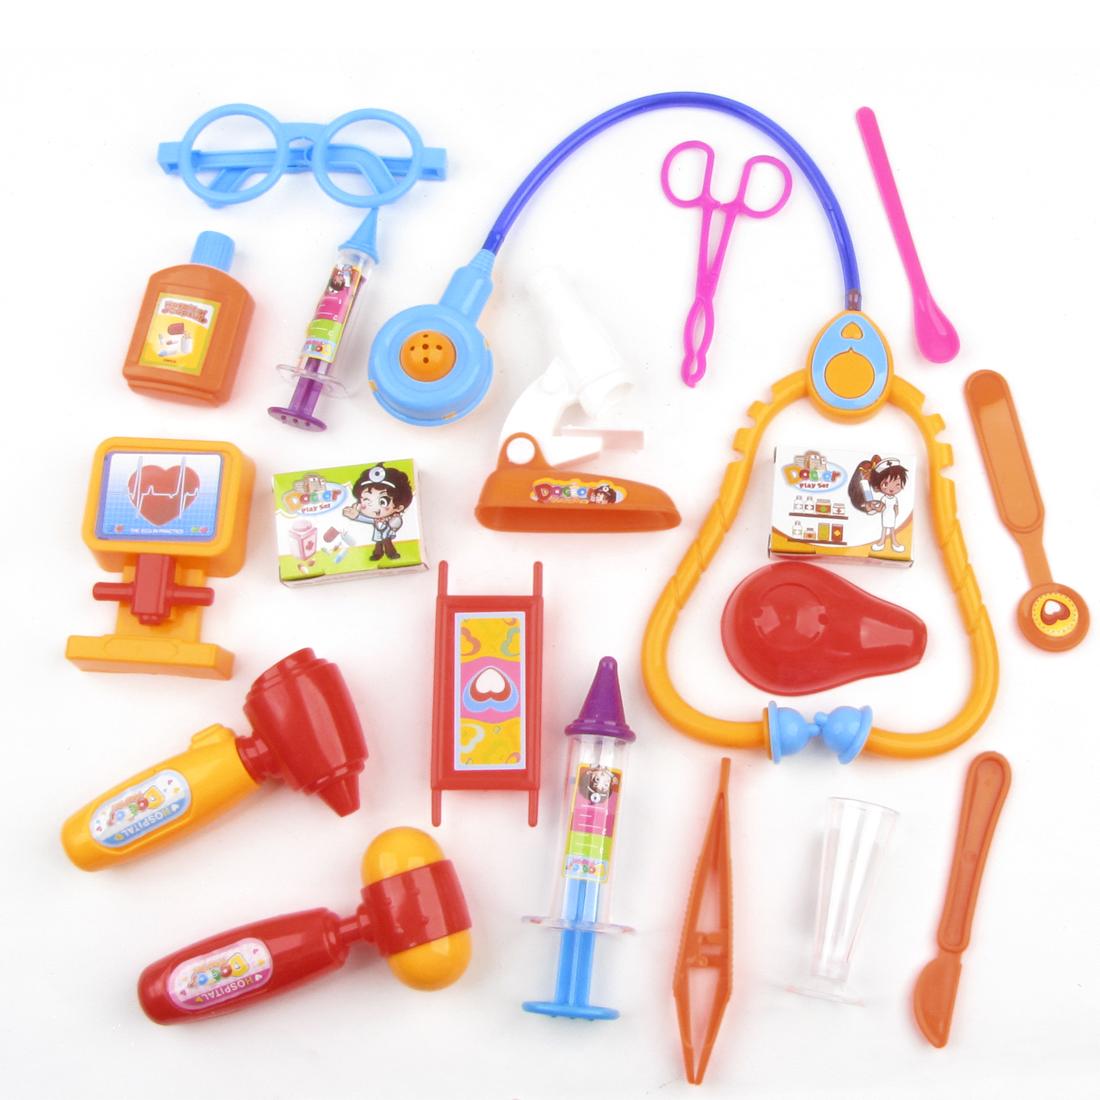 19 in 1 Child Fuchsia Orange Dark Yellow Injector Stethoscope Mini Hospital Toy